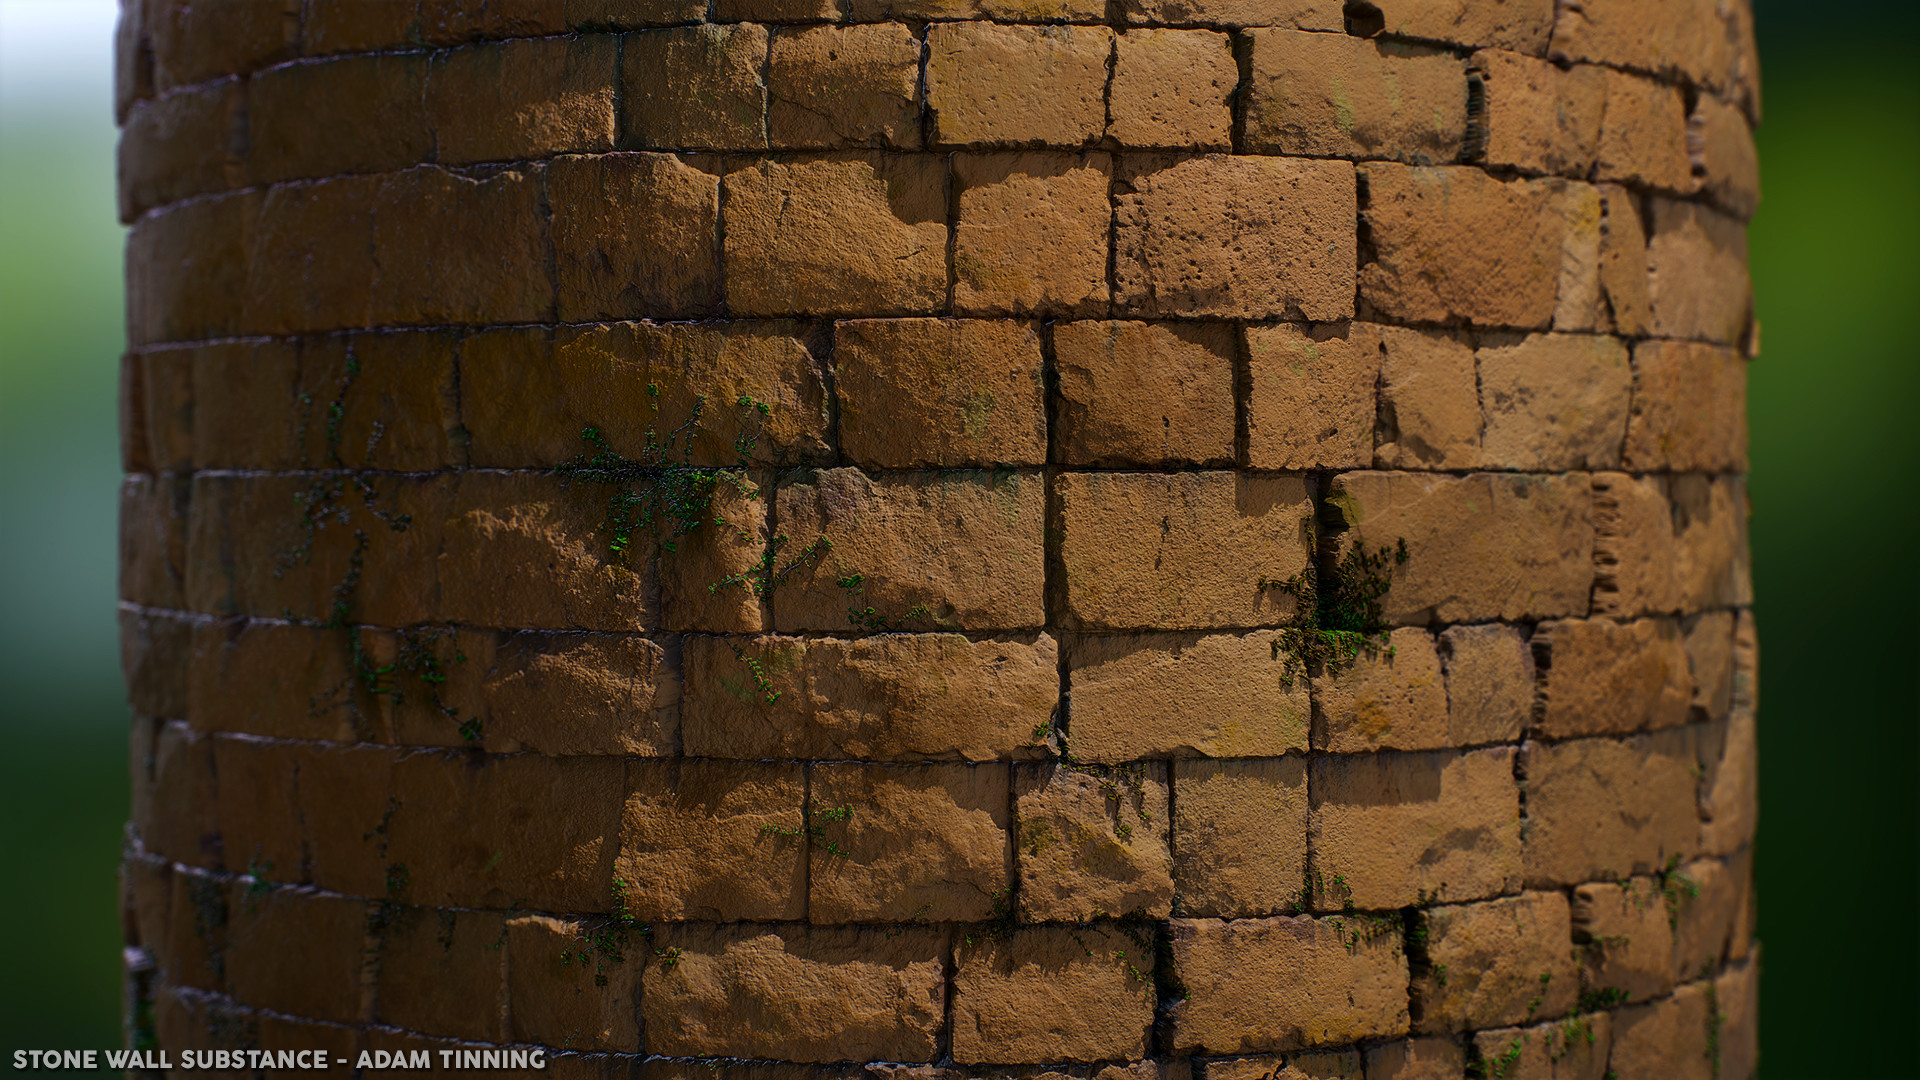 Adam tinning stonewall render 04